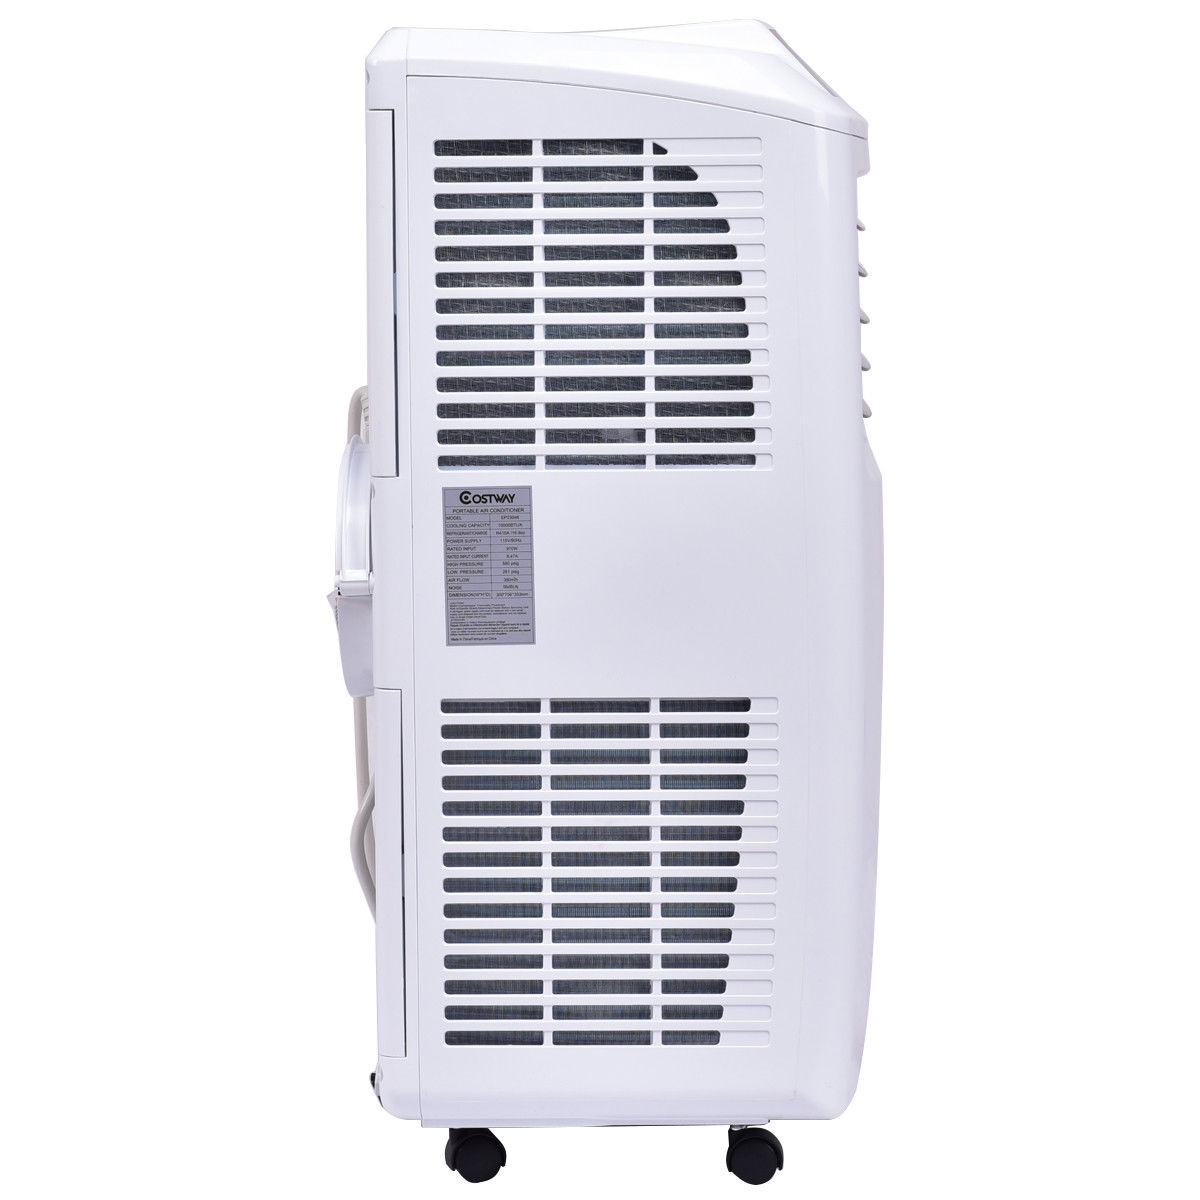 10000 BTU Portable Dehumidifier Air Conditioner with Window